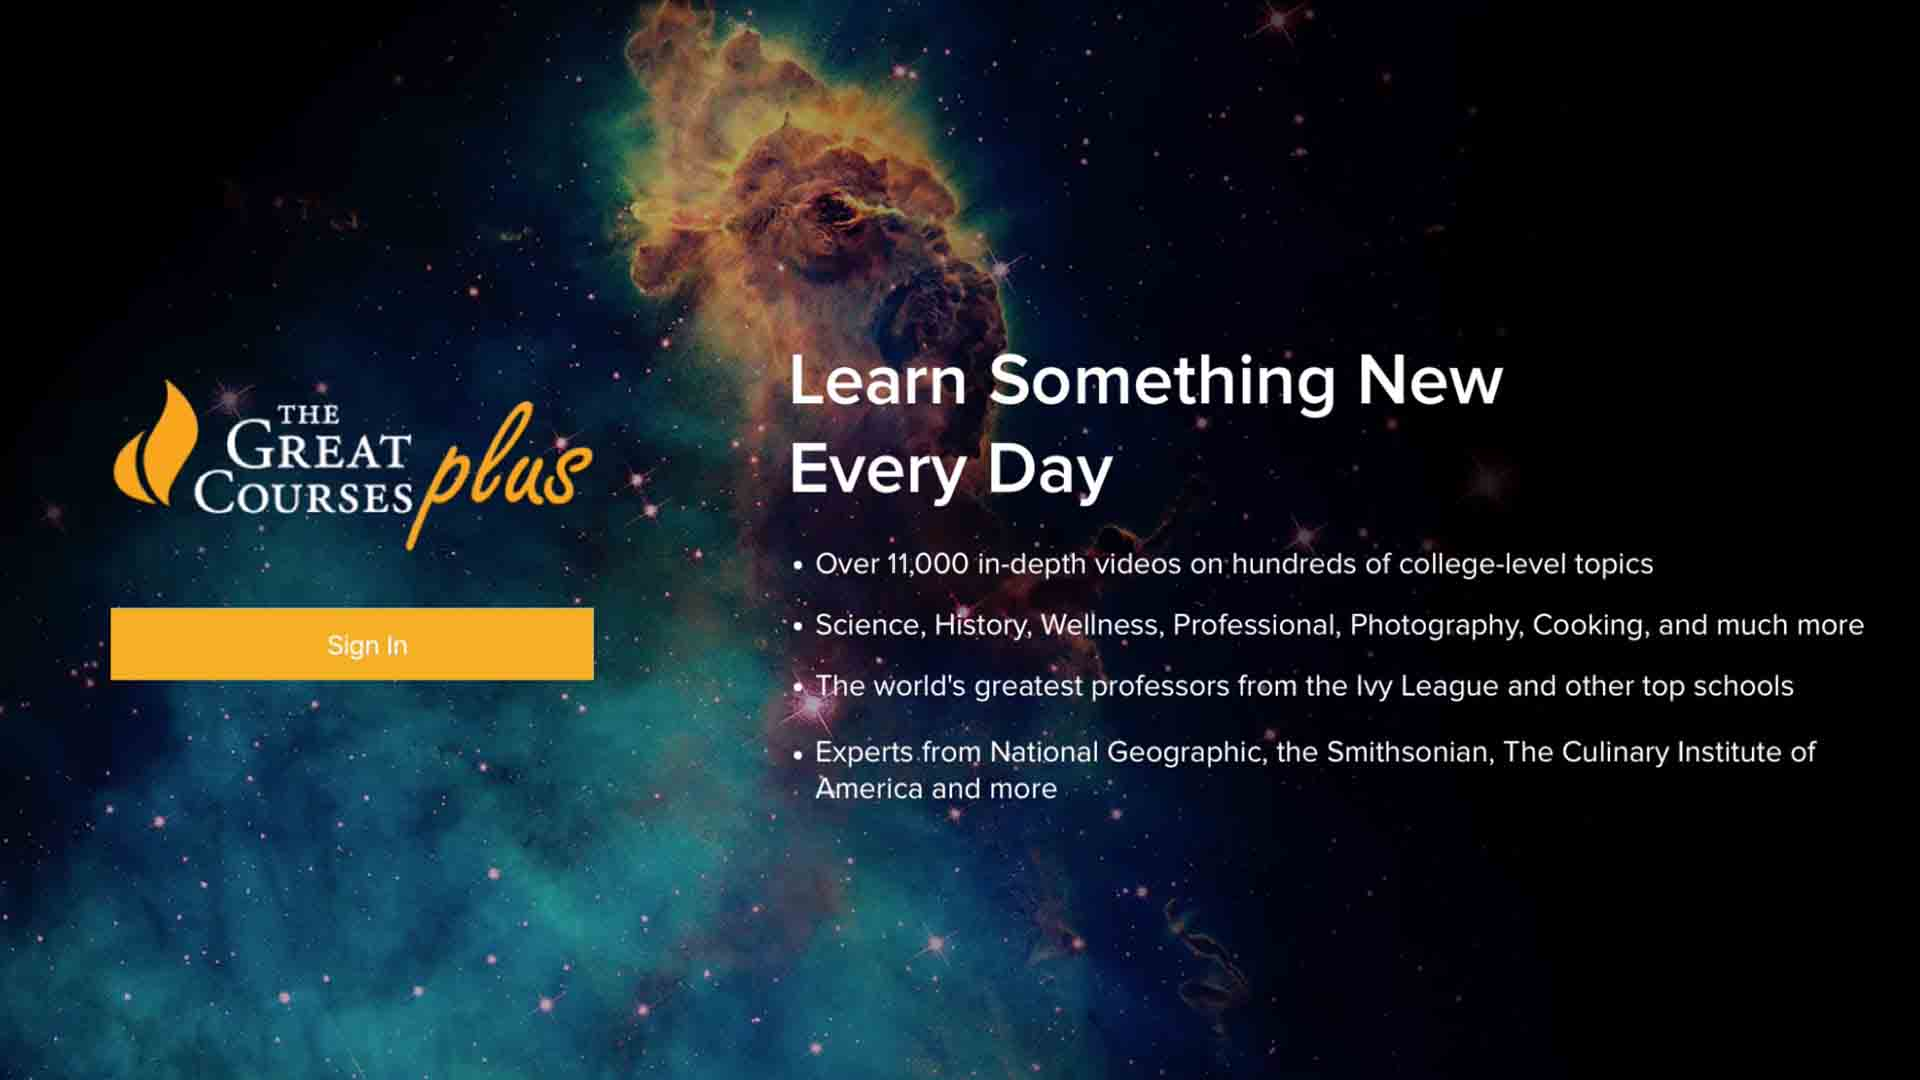 19 Aplikasi Edukasi Terbaik Untuk Anak Dan Pelajar